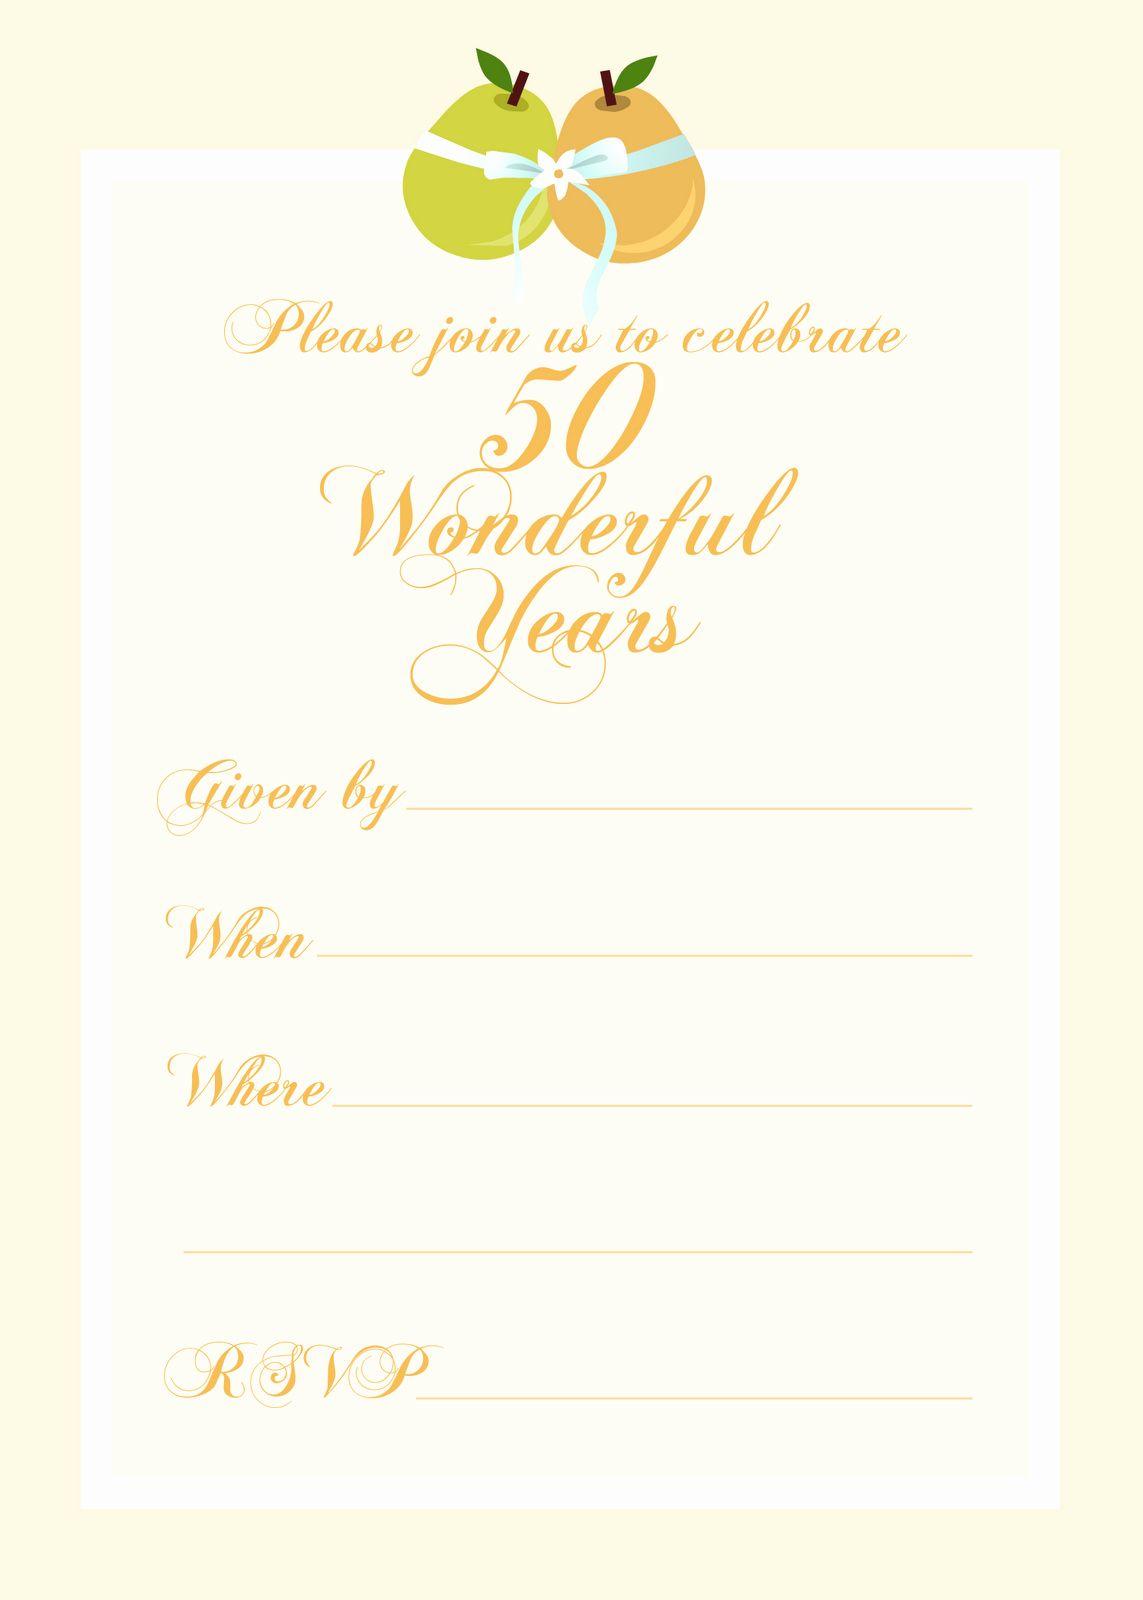 50th Wedding Anniversary Invitations Template Elegant Free In 2020 50th Wedding Anniversary Invitations Wedding Anniversary Invitations Wedding Invitation Card Design